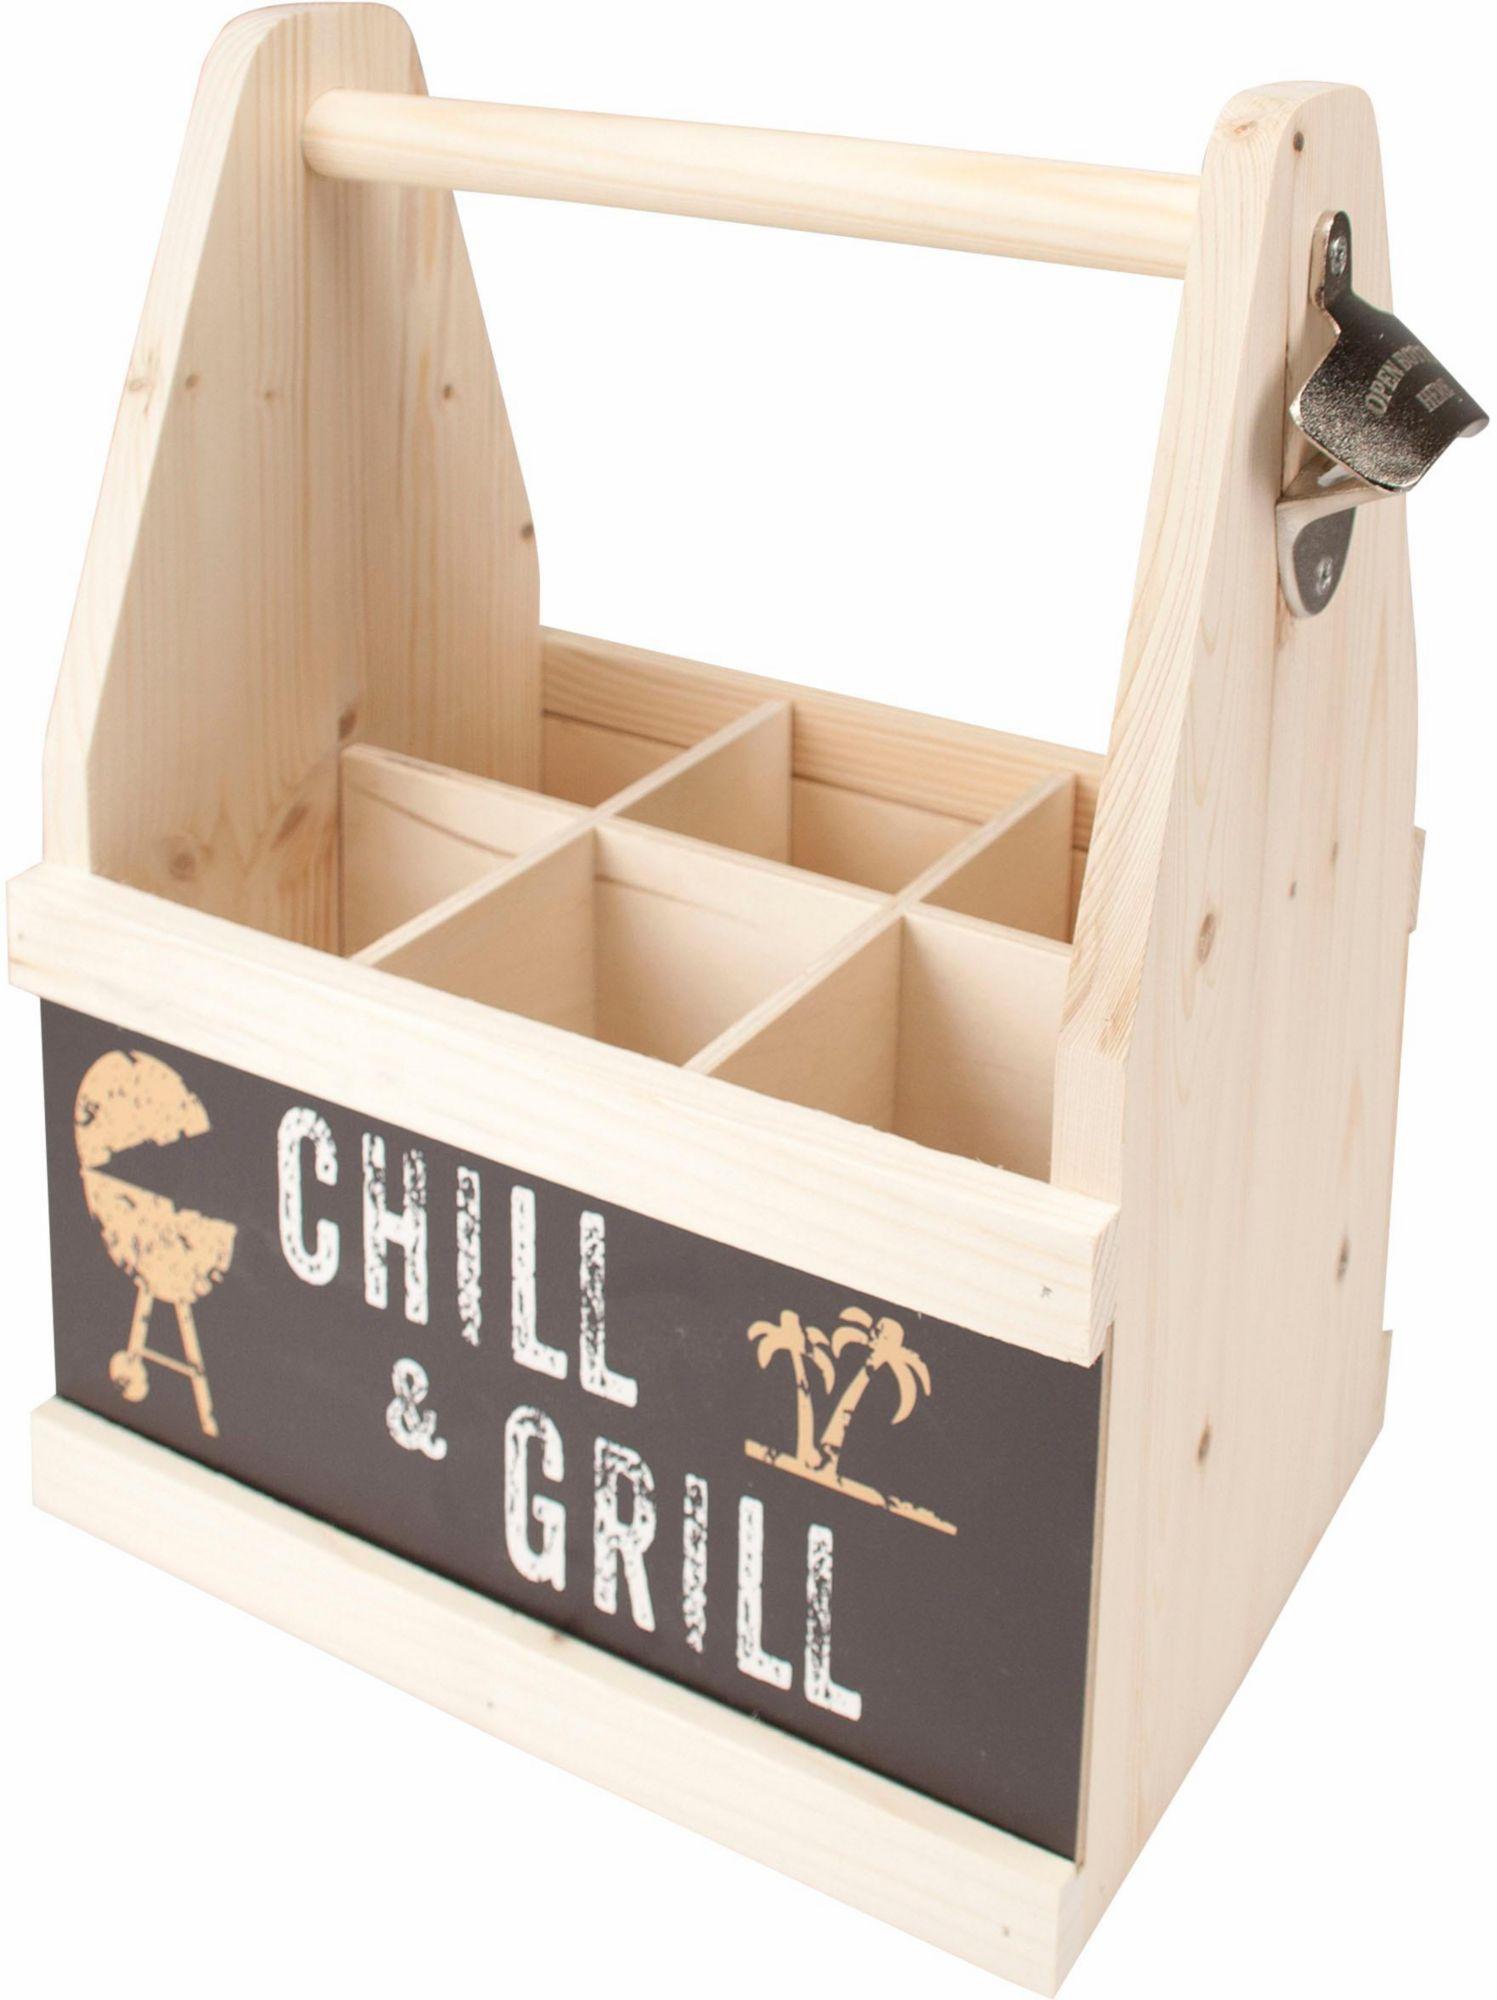 CONTENTO Contento Bier Caddy »Chill & Grill«, Holz